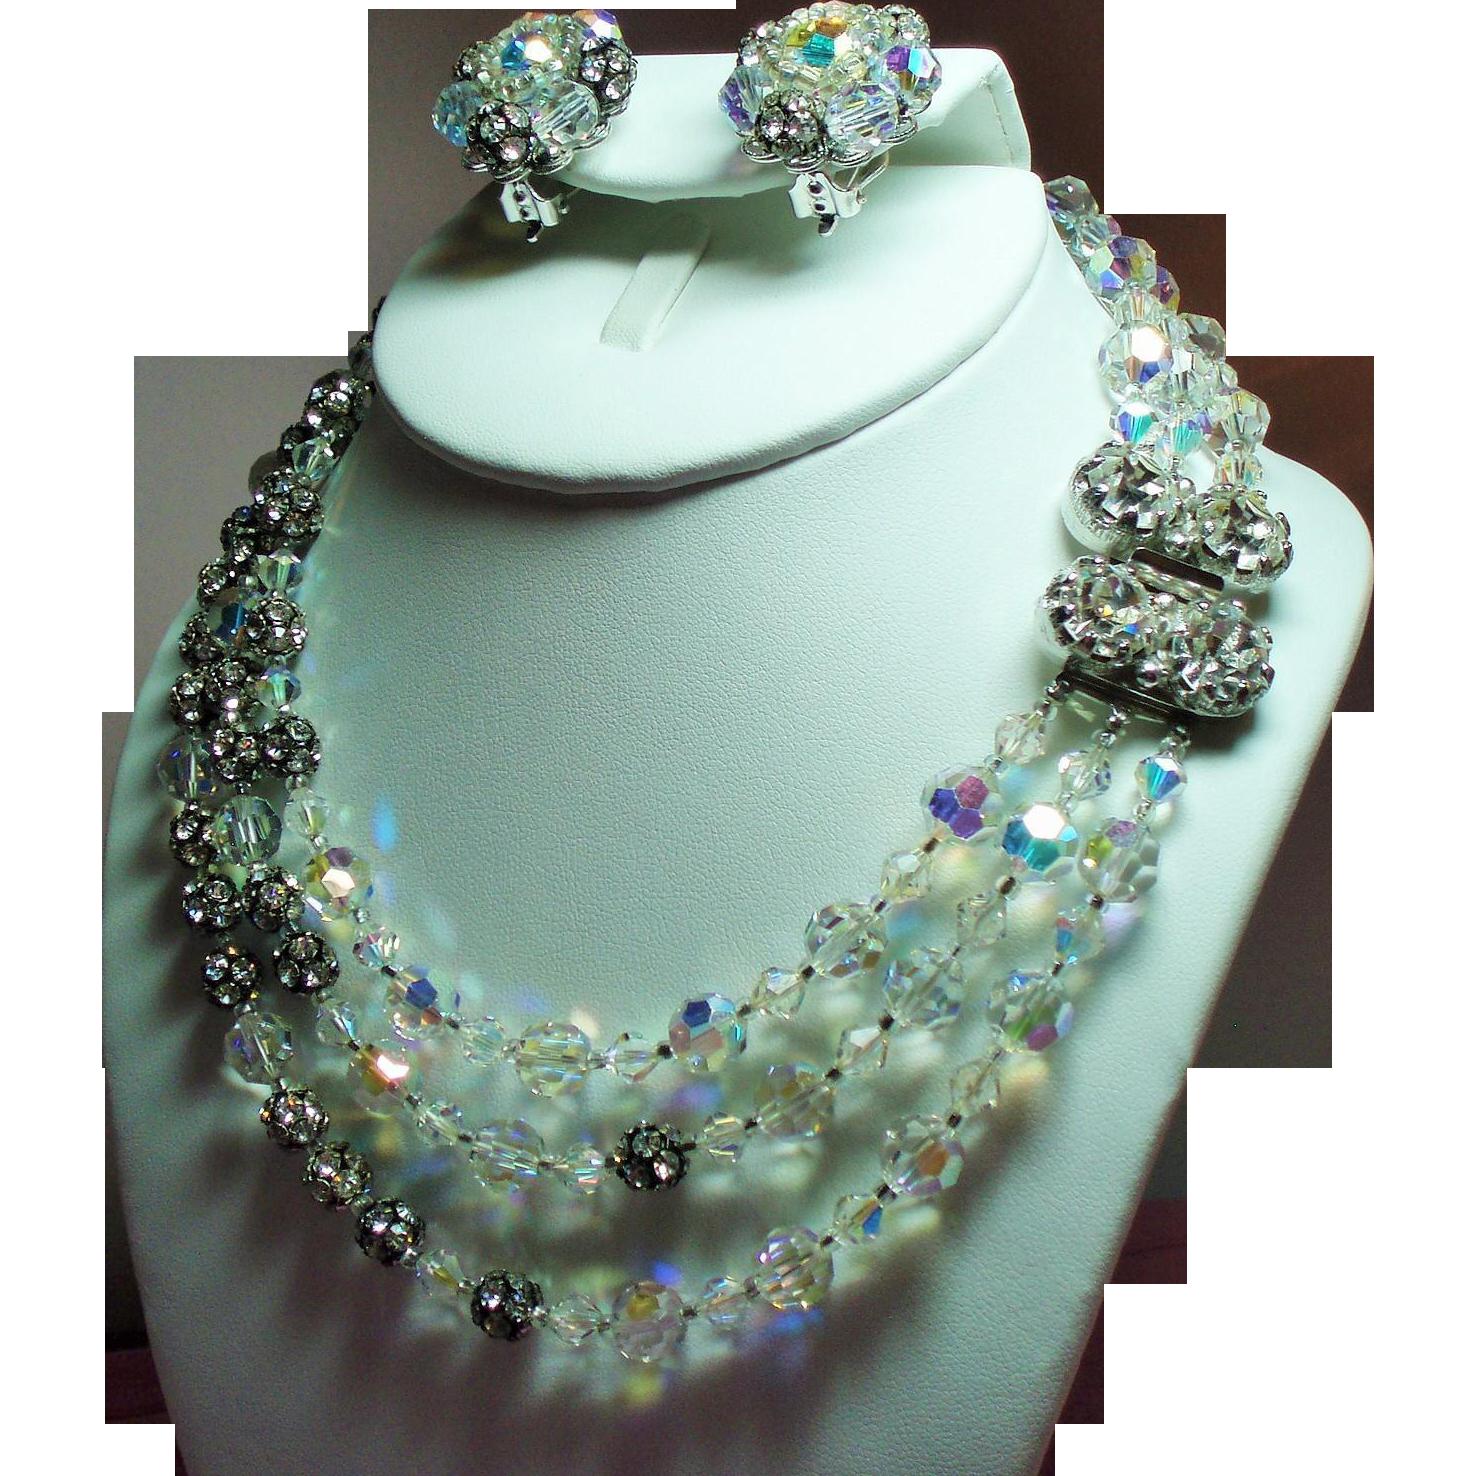 Vintage Original By Robert Crystal Bead Rhinestone Ball Triple Strand Necklace & Earrings Set